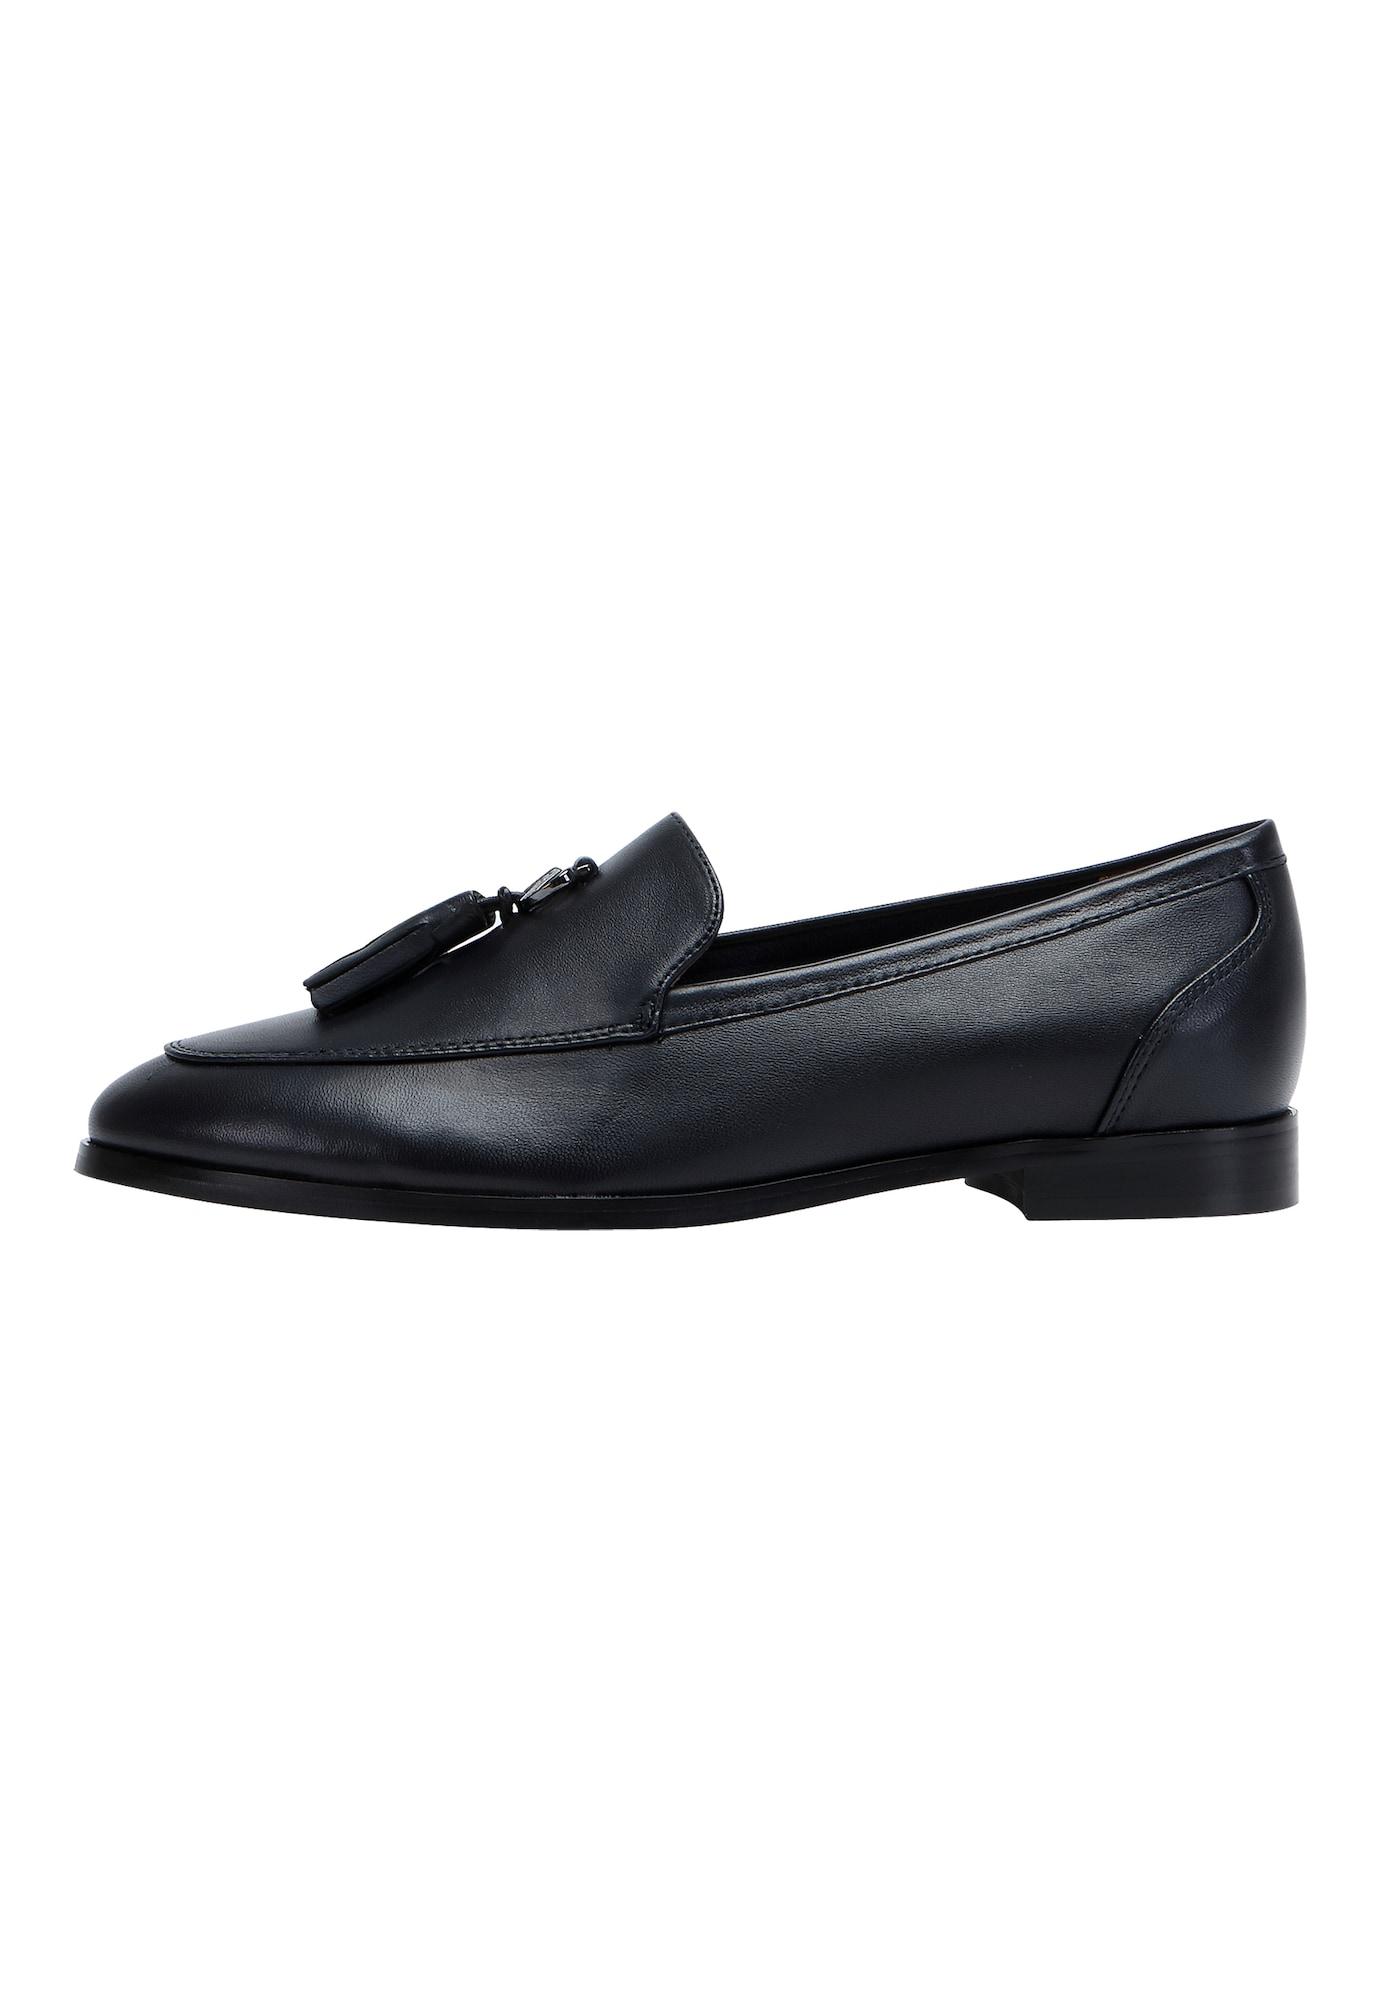 ekonika - Loafer